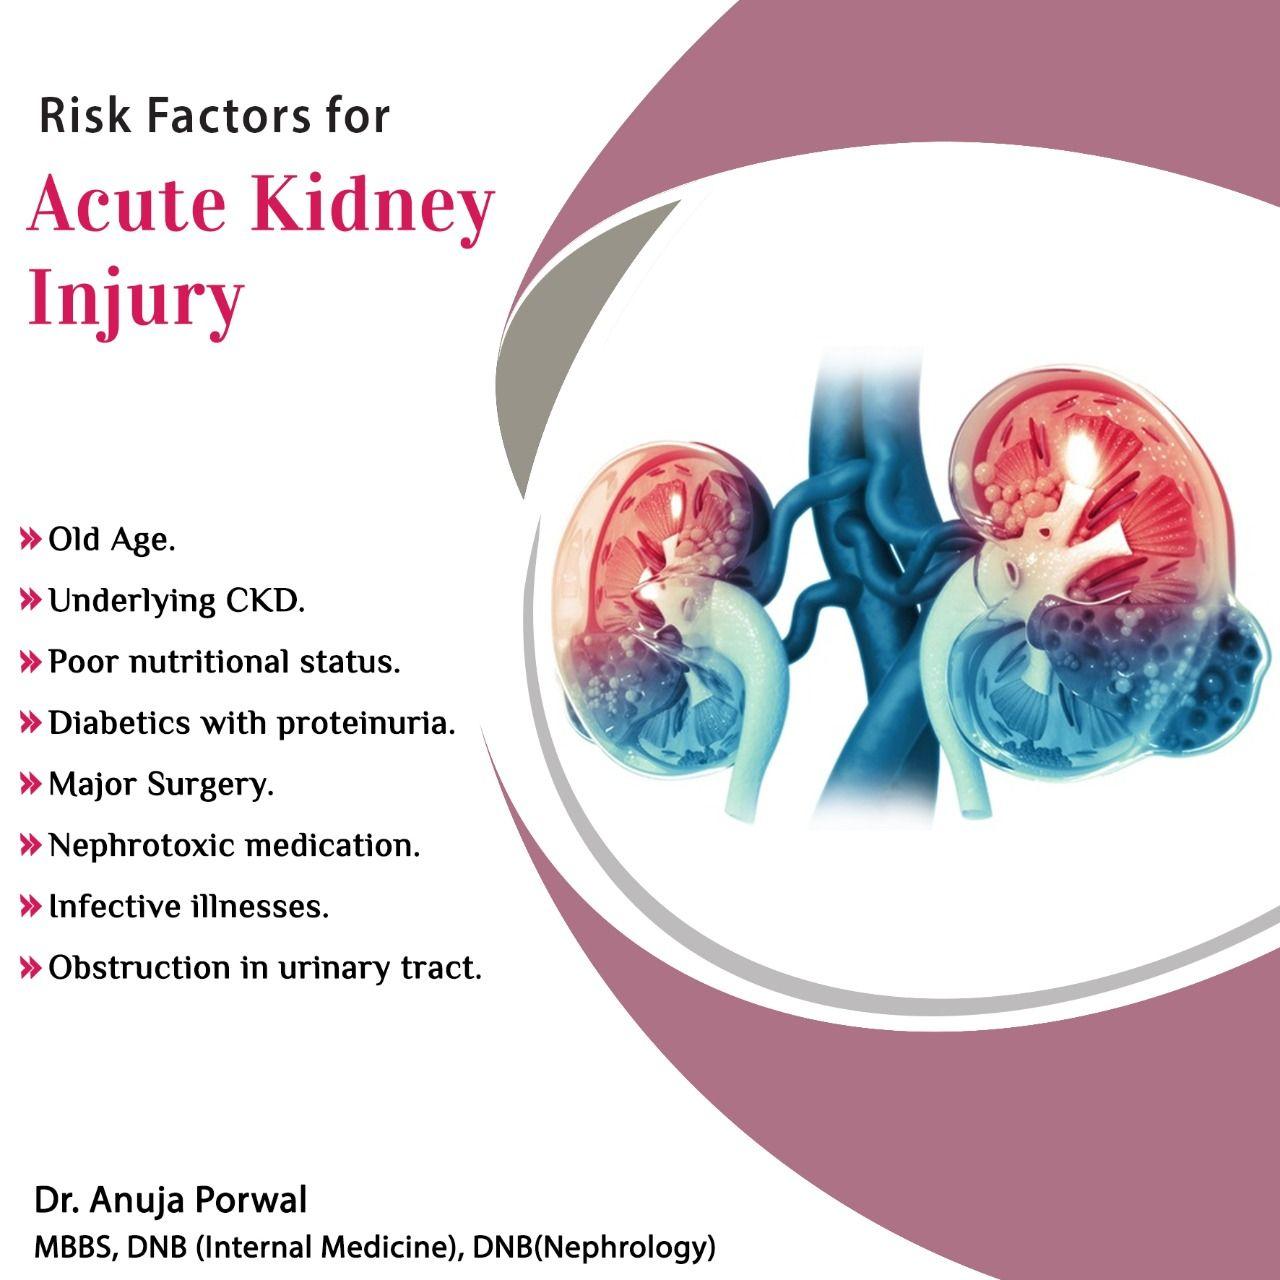 Risk Factors For Acute Kidney Injury In 2020 Acute Kidney Injury Acute Renal Failure Risk Factors